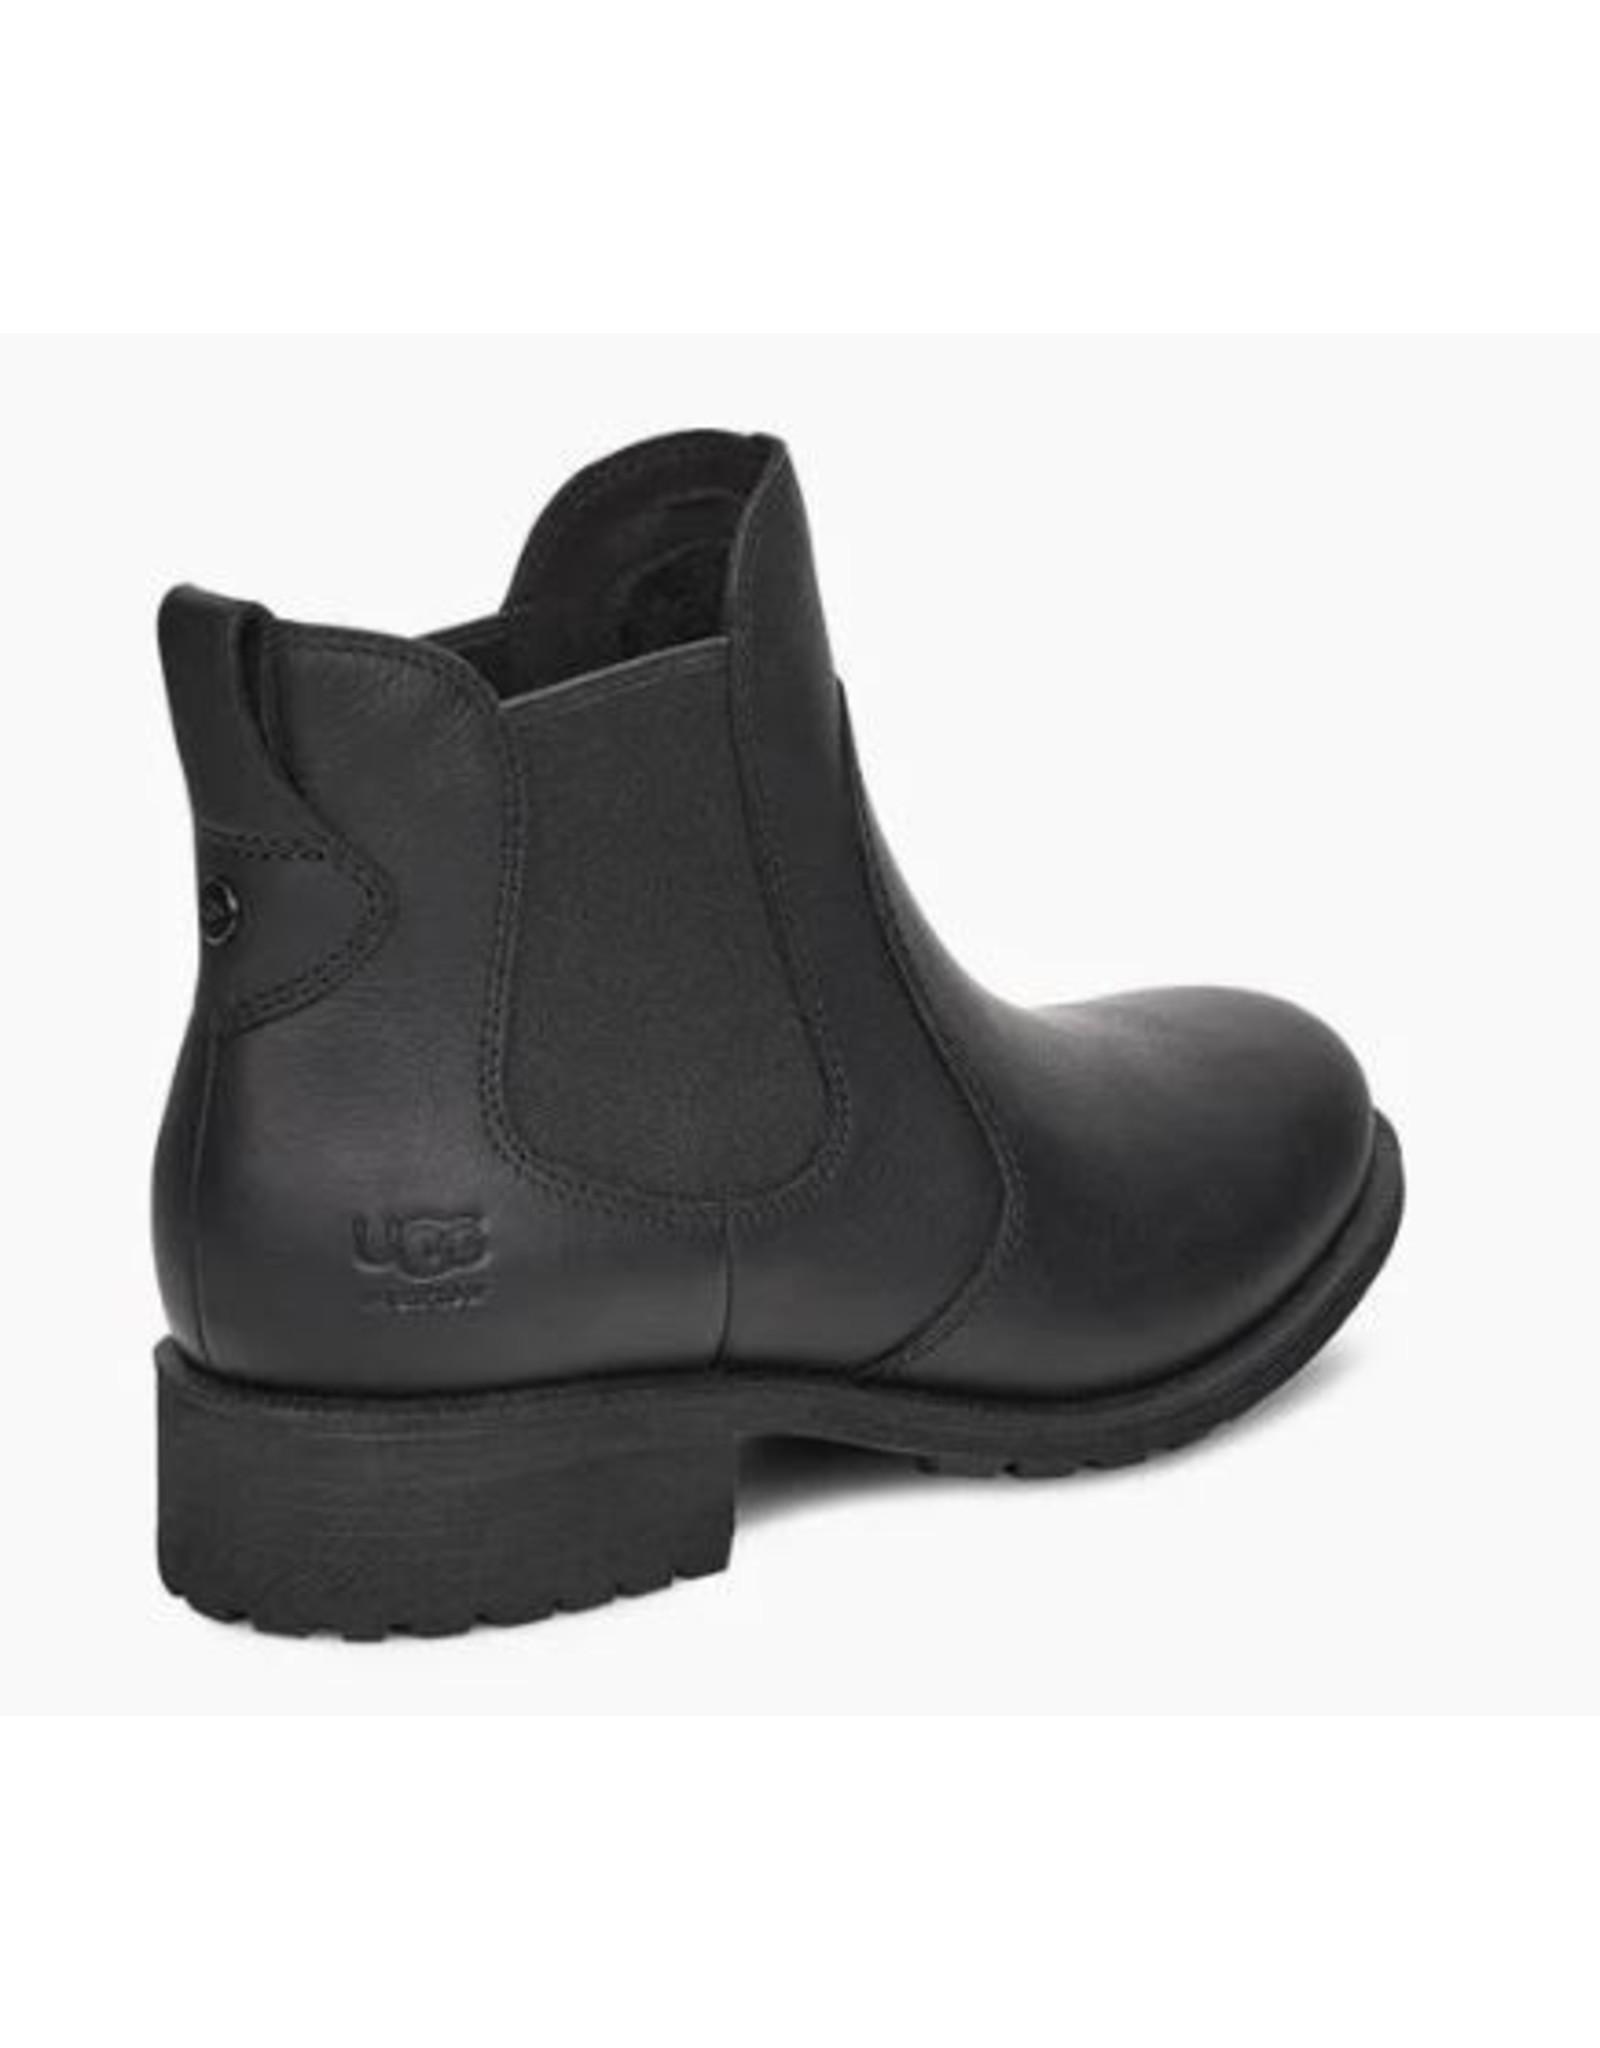 Uggs Bonham Boot - 19AF